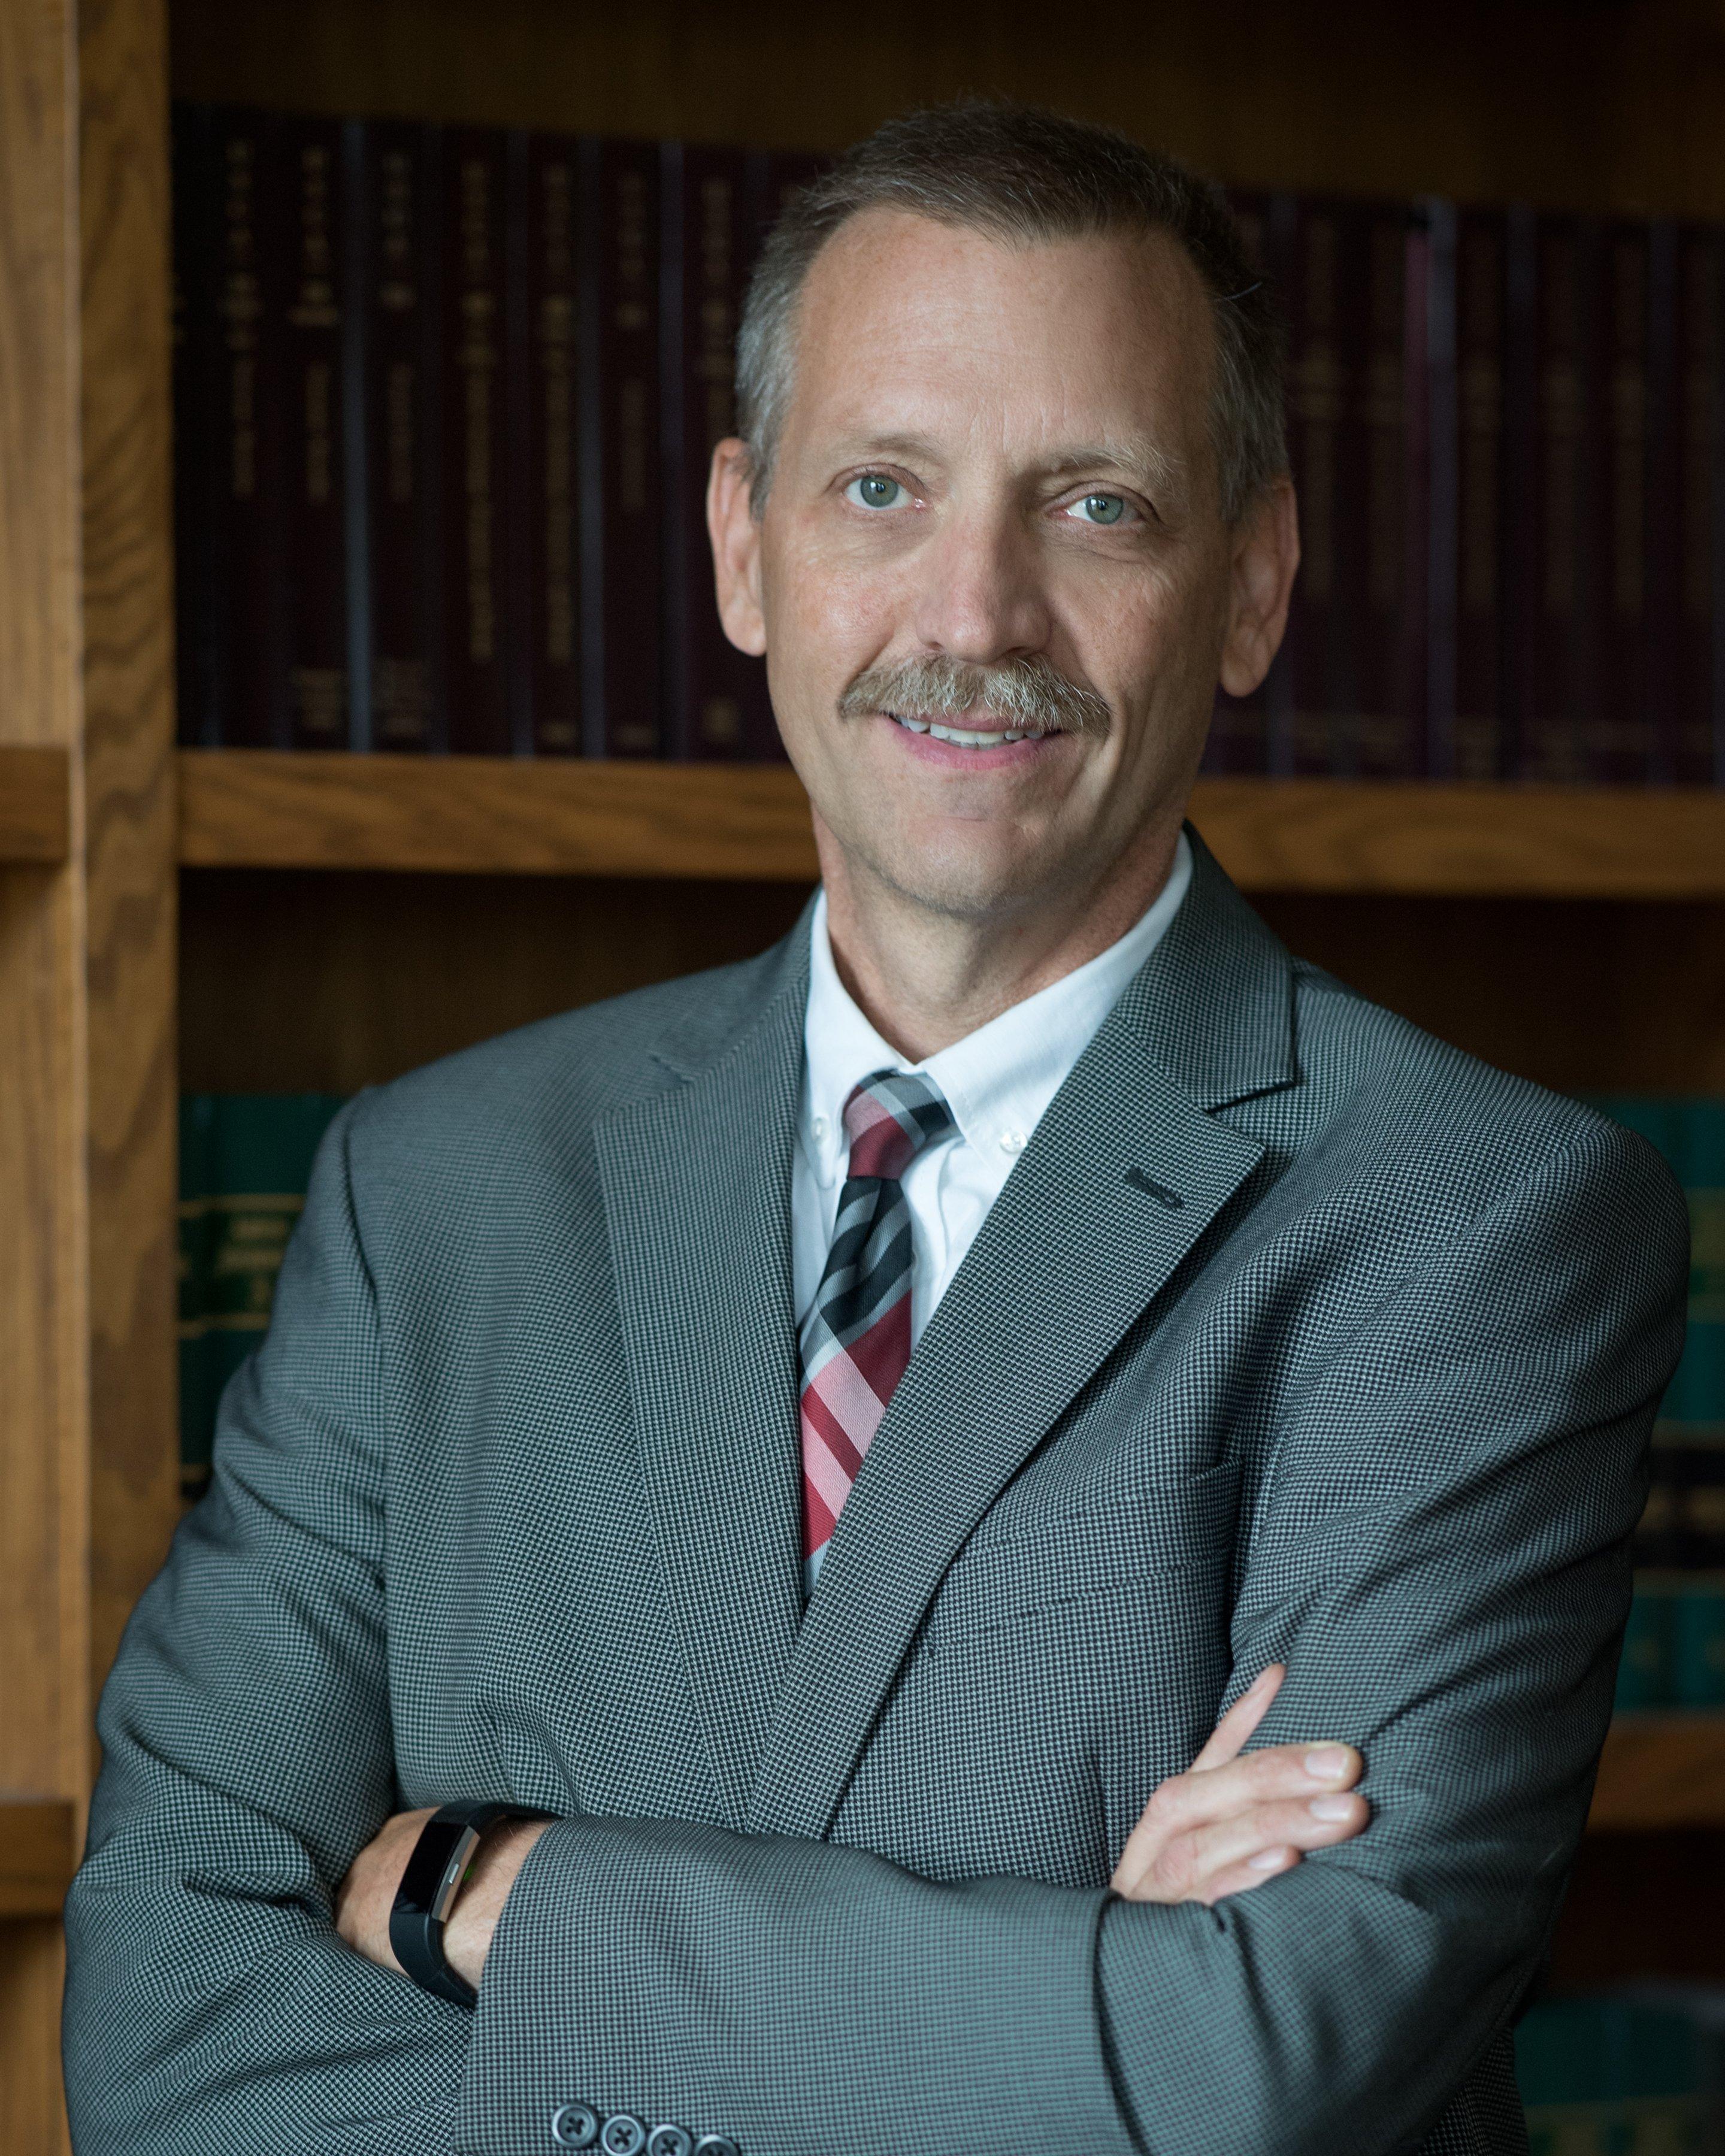 Todd D. Kranda lawyer bismarck mandan nd